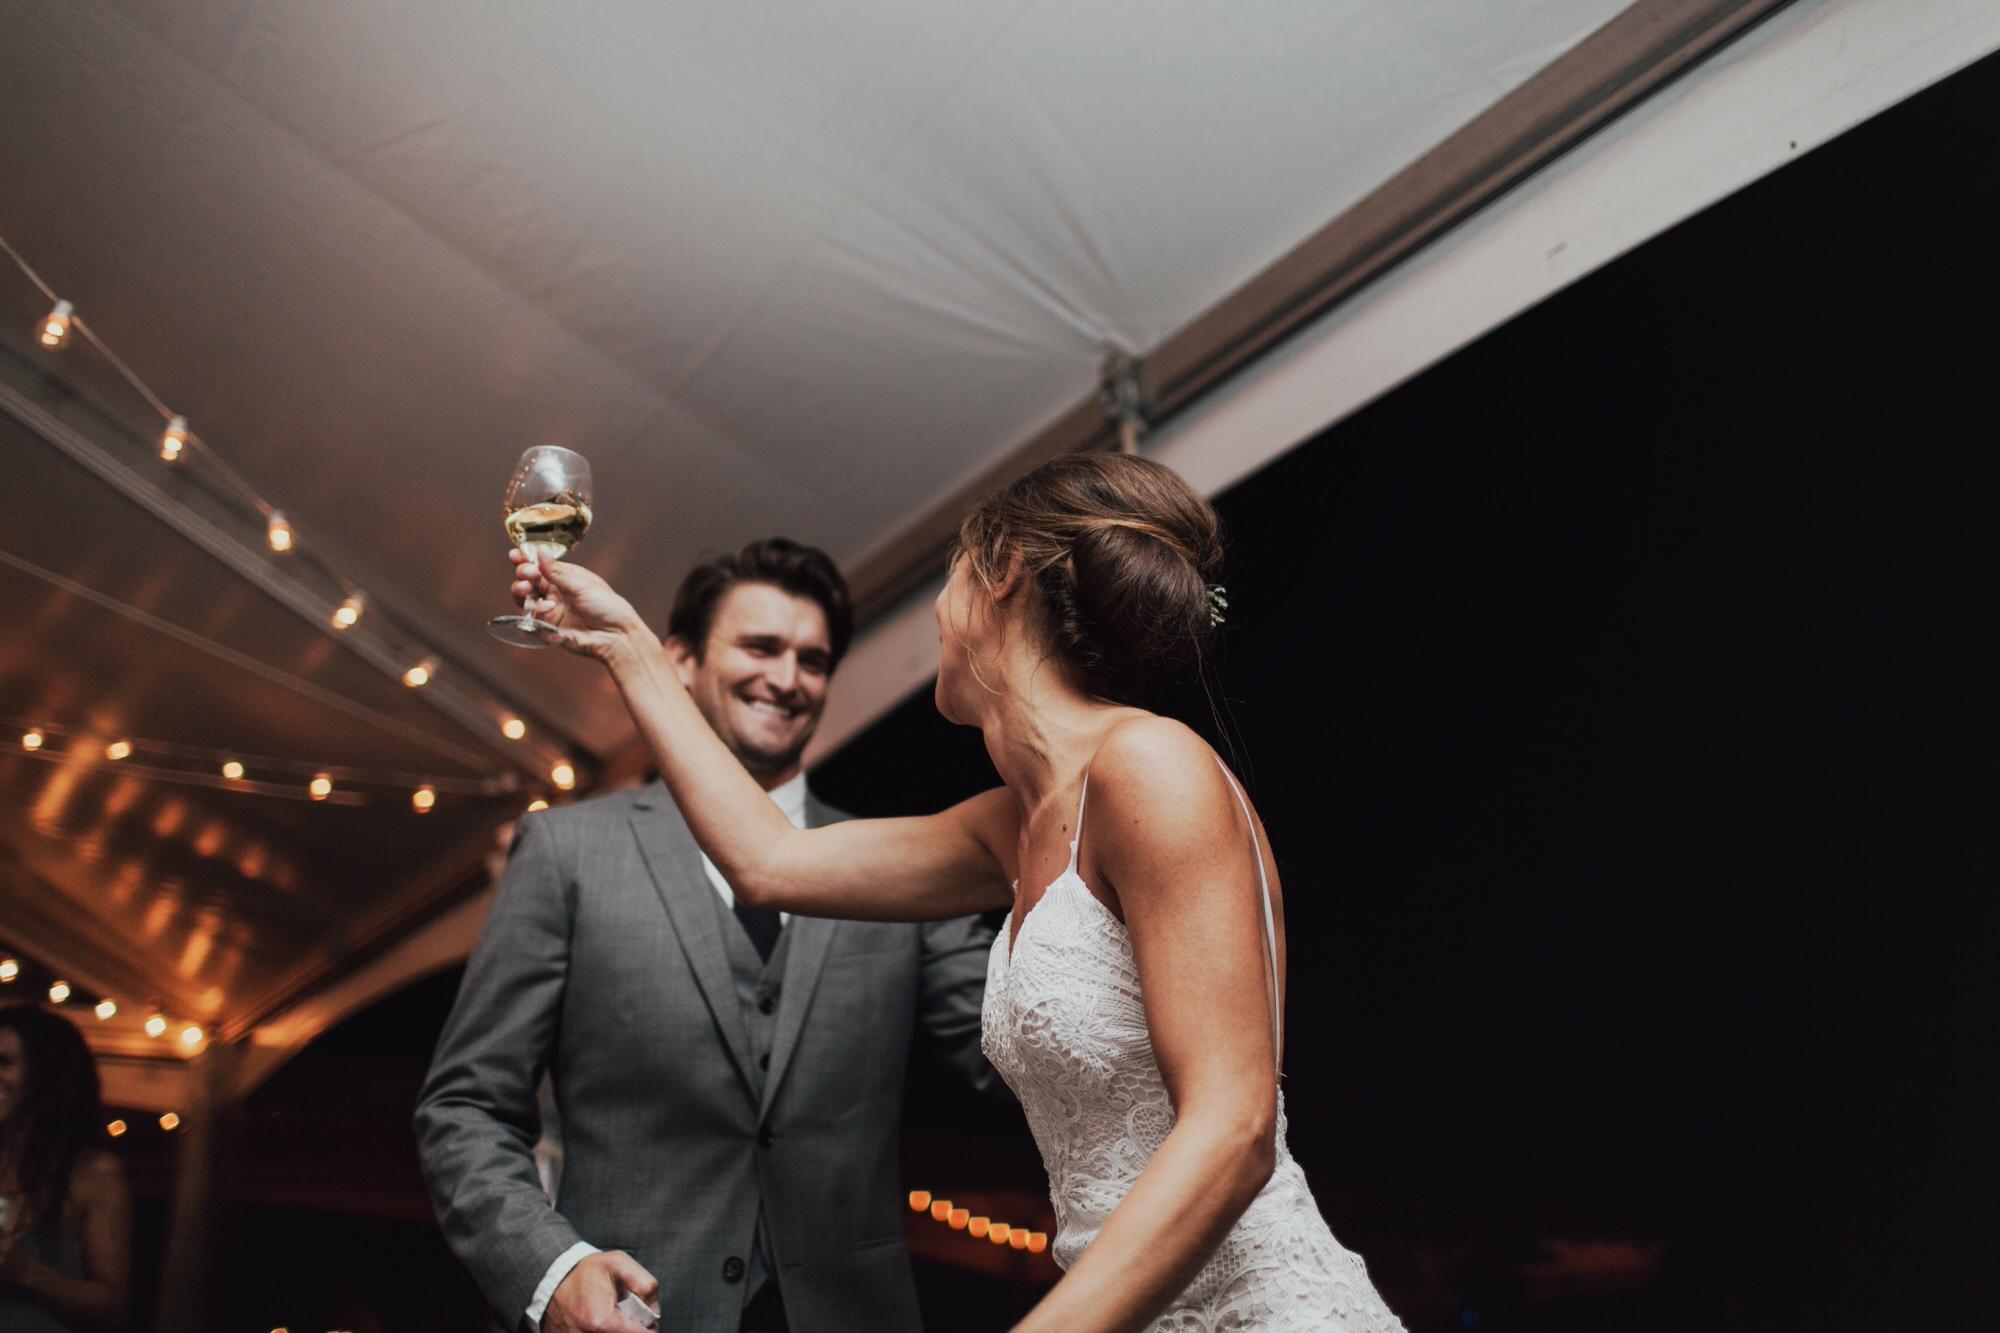 emily-aaron-rochester-new-york-wedding-photographer-123.JPG